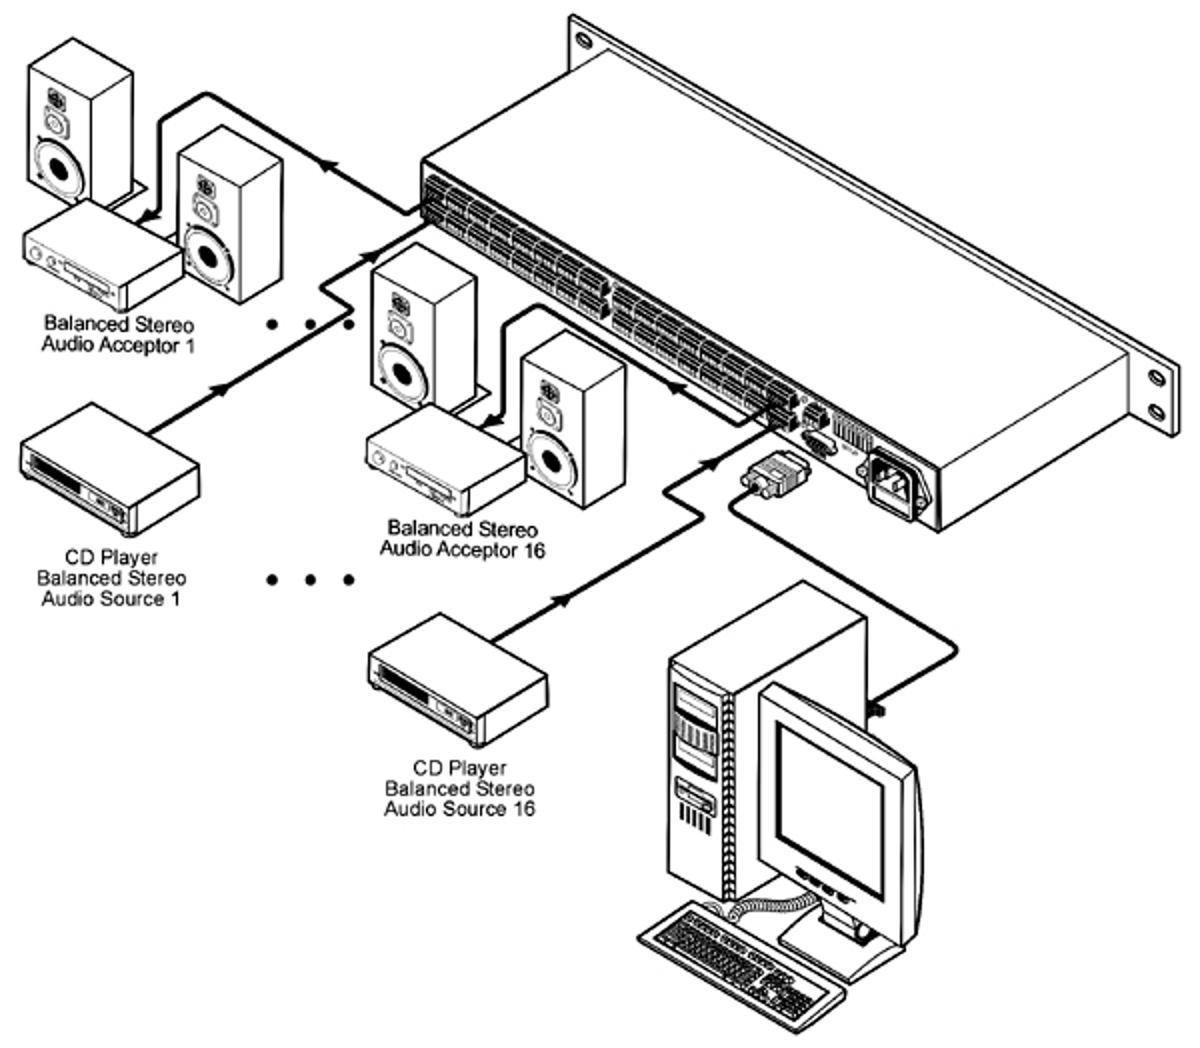 Kramer VA-8XL 81-0032810 8 Channel Balanced Stereo Audio